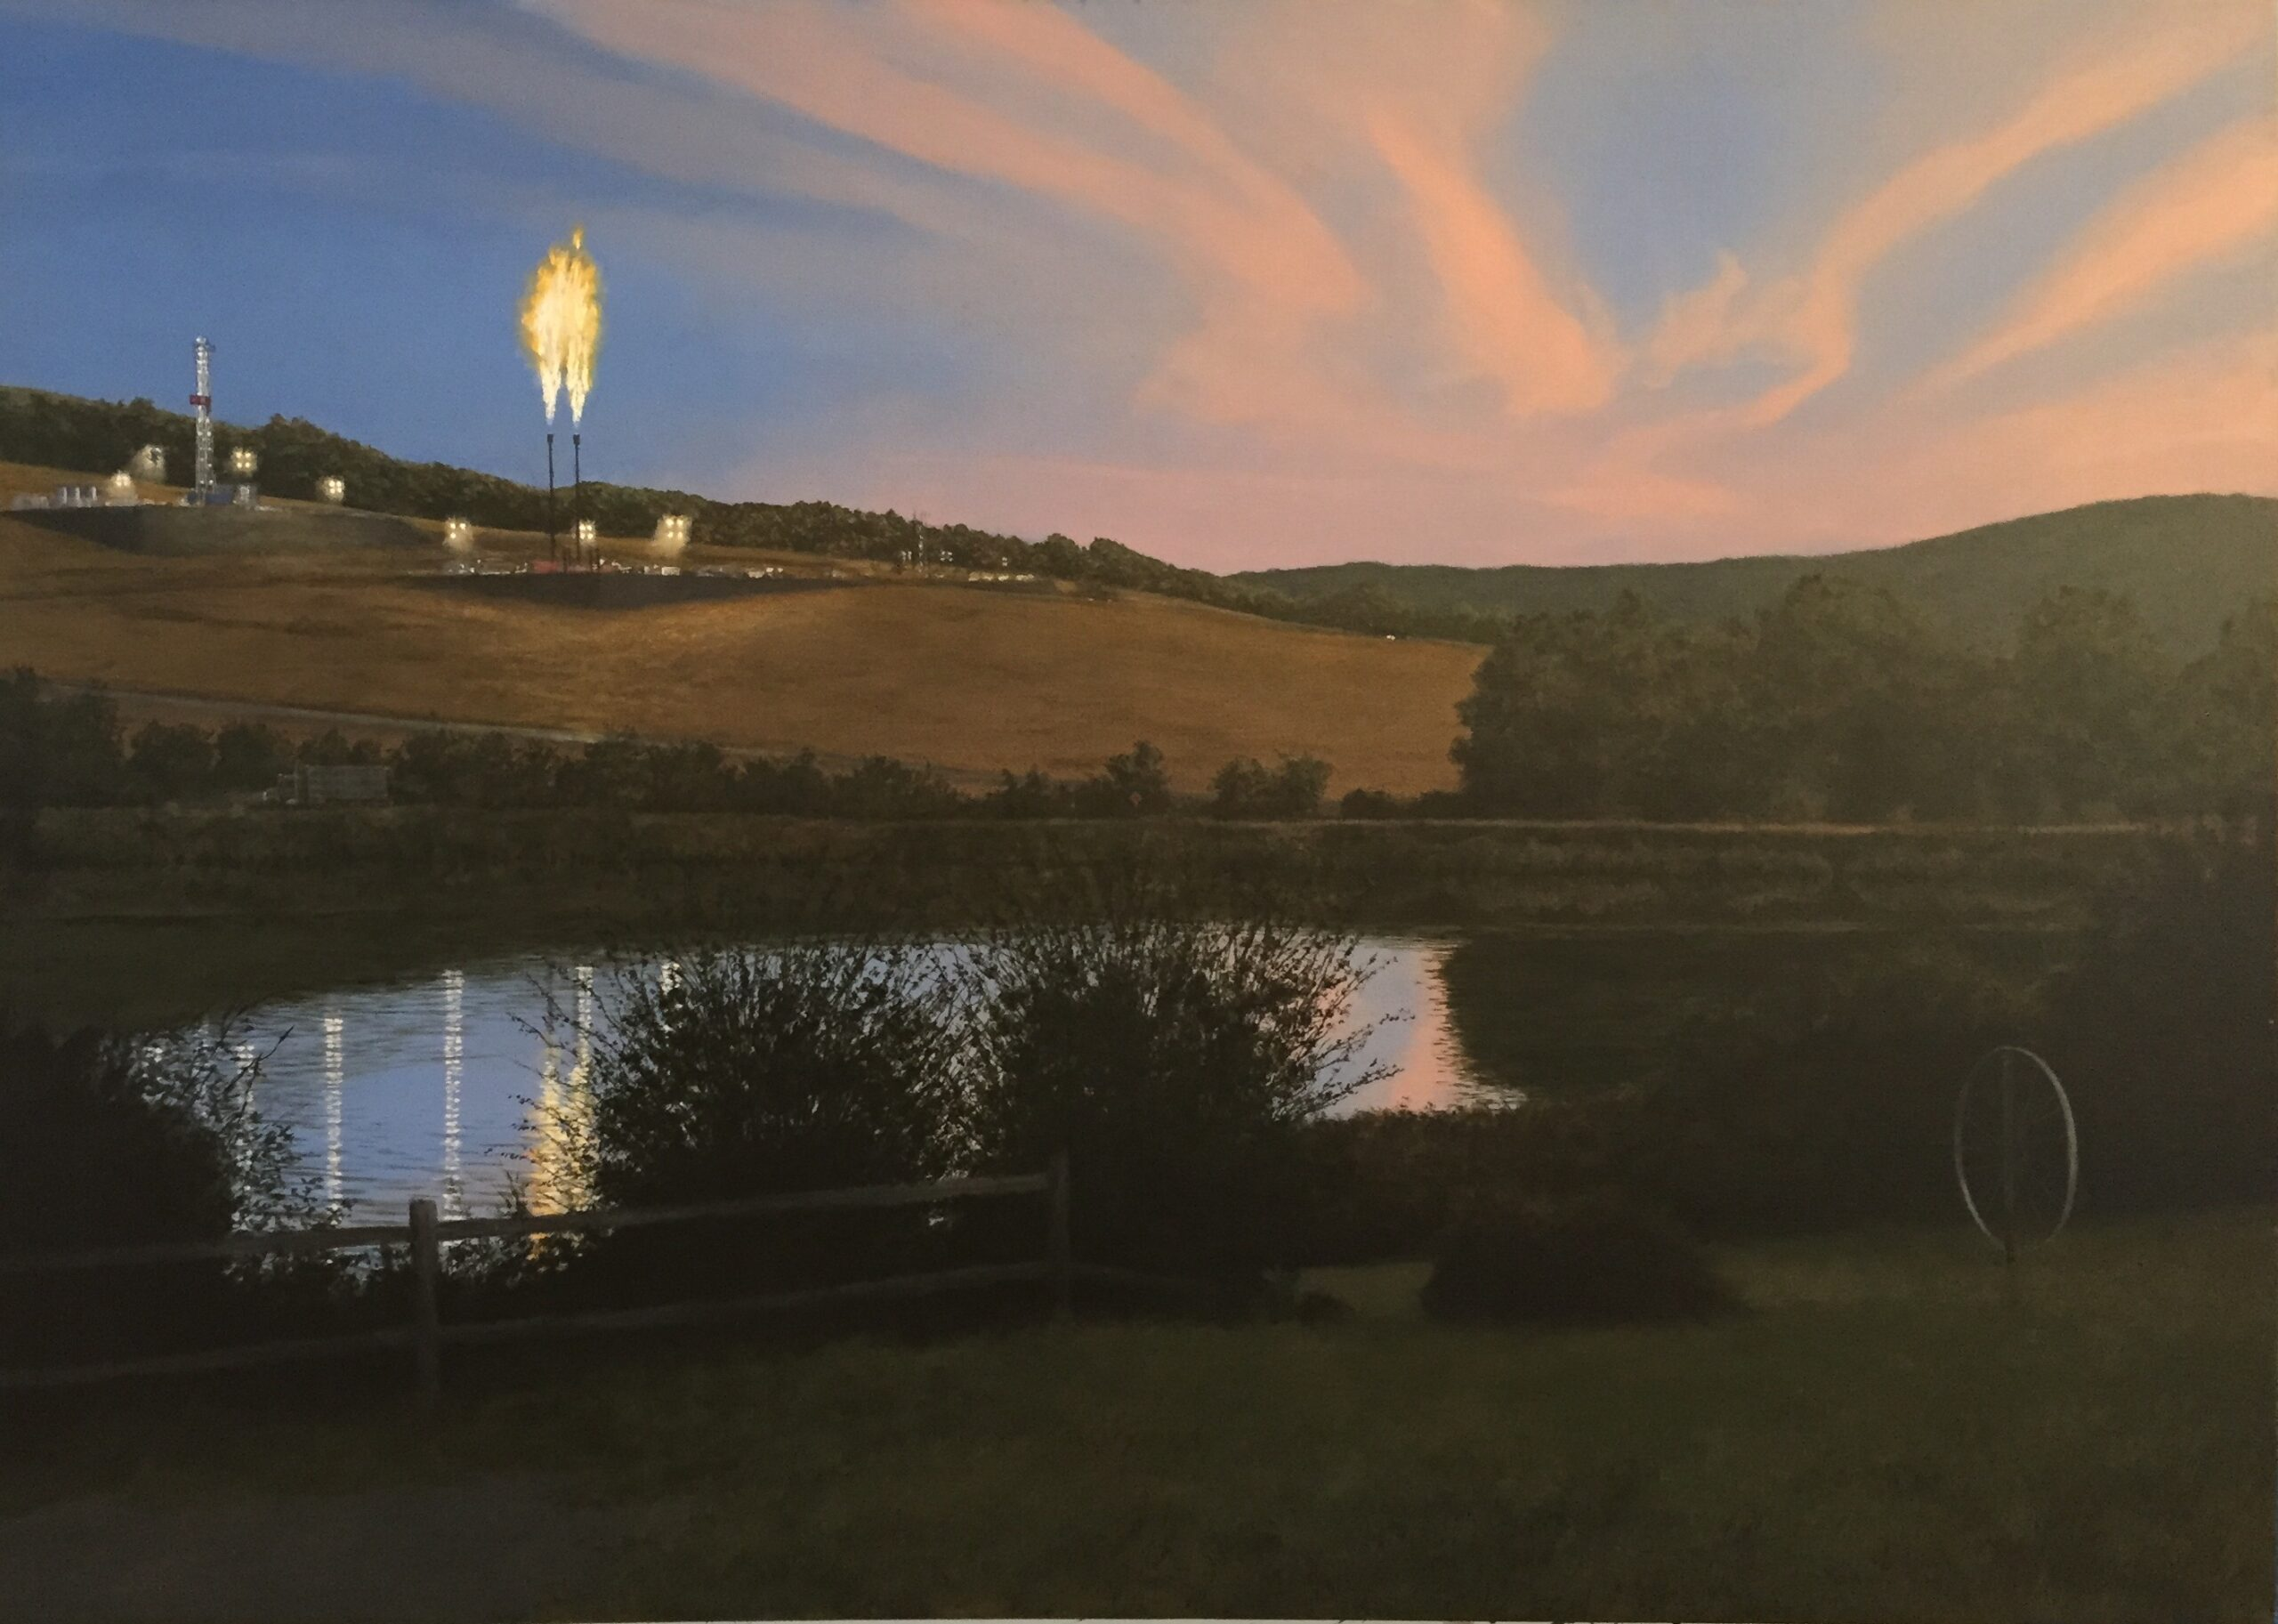 """Alpine Lake Fracking"" by Tim Daly, acrylic on canvas, 42 x 60"